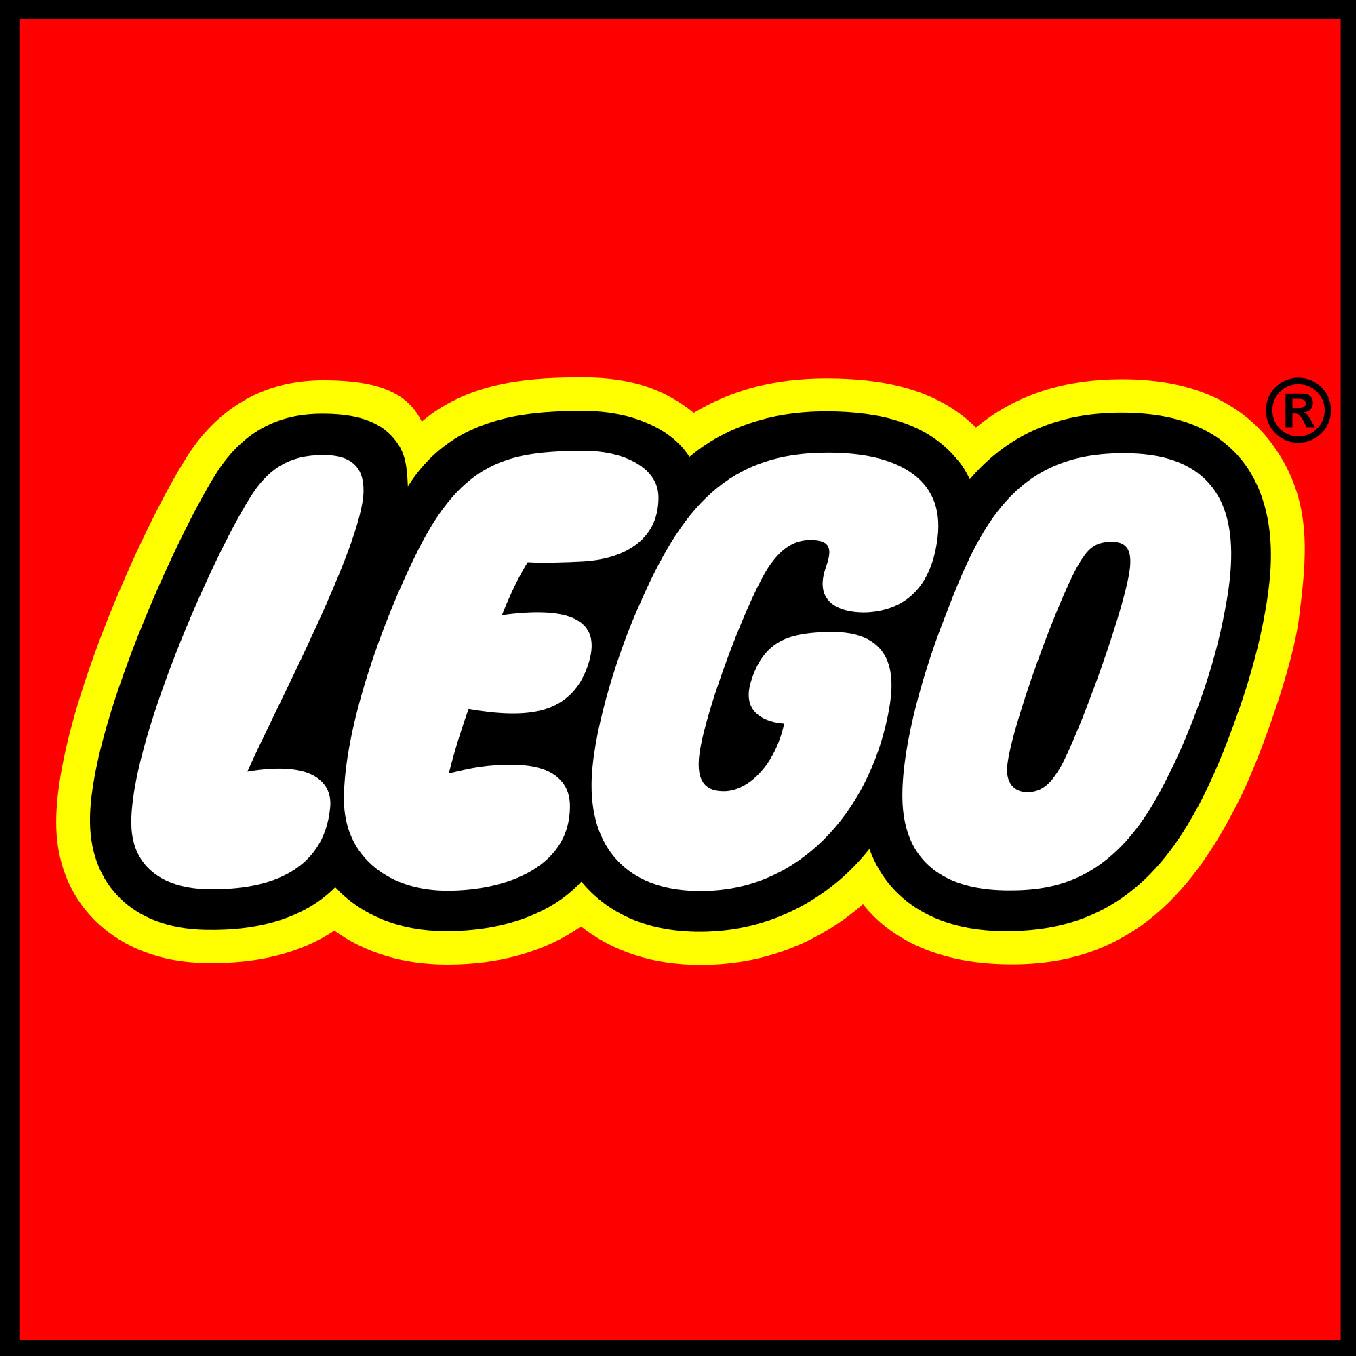 Warner Bros. Interactive Entertainment Announces LEGO Friends